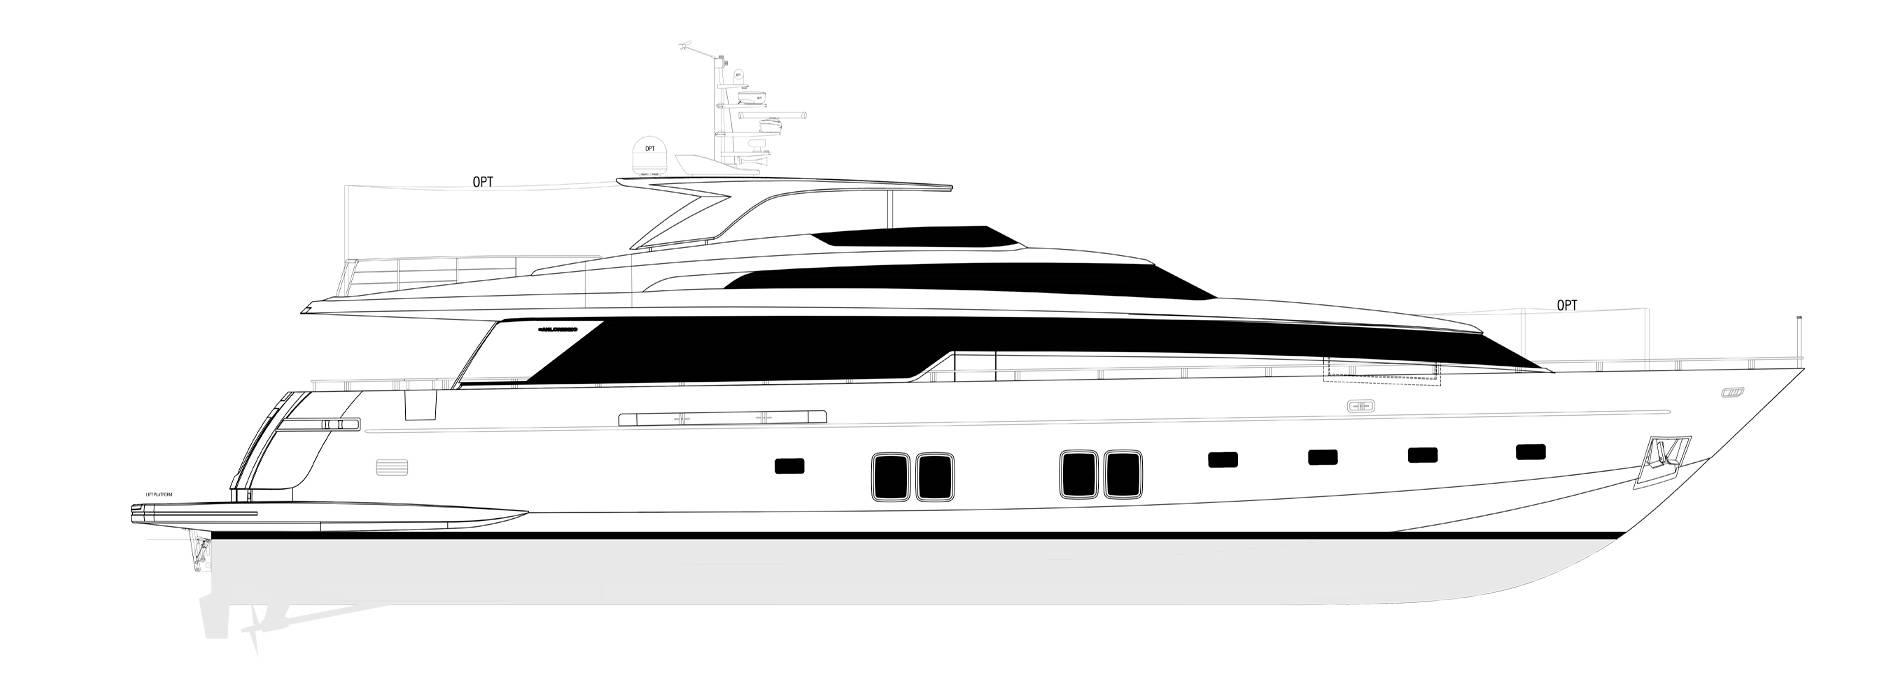 Sanlorenzo Yachts SL106-625 Perfil